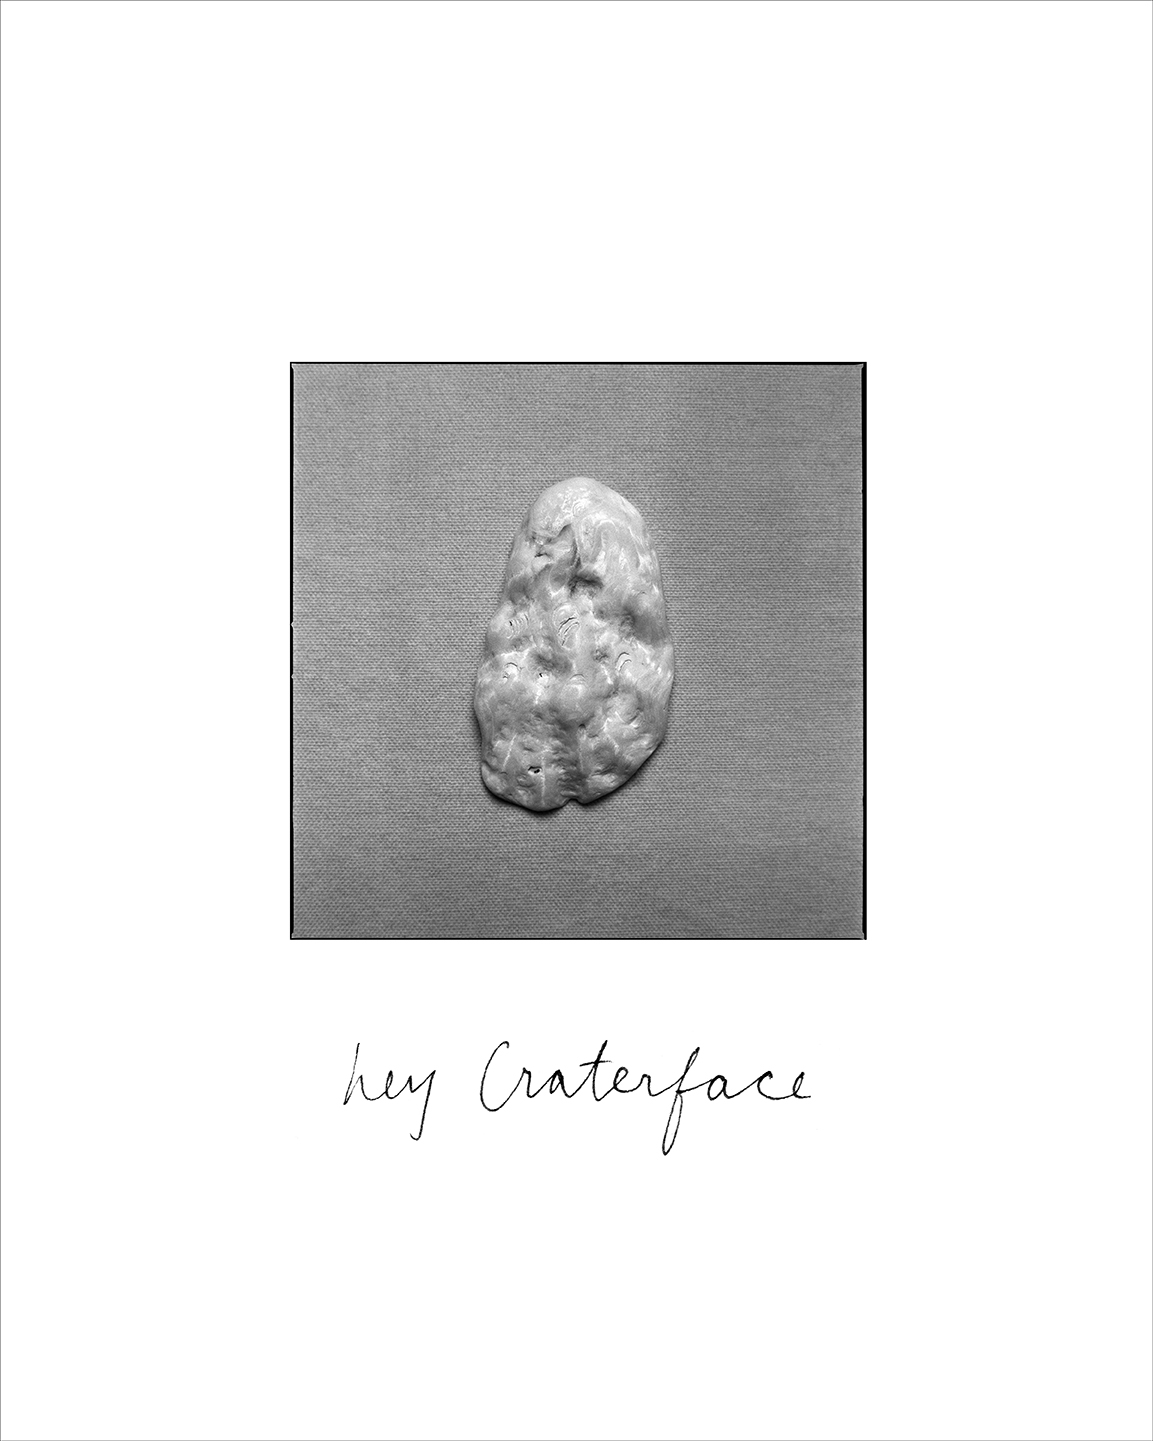 heycraterface4.jpg